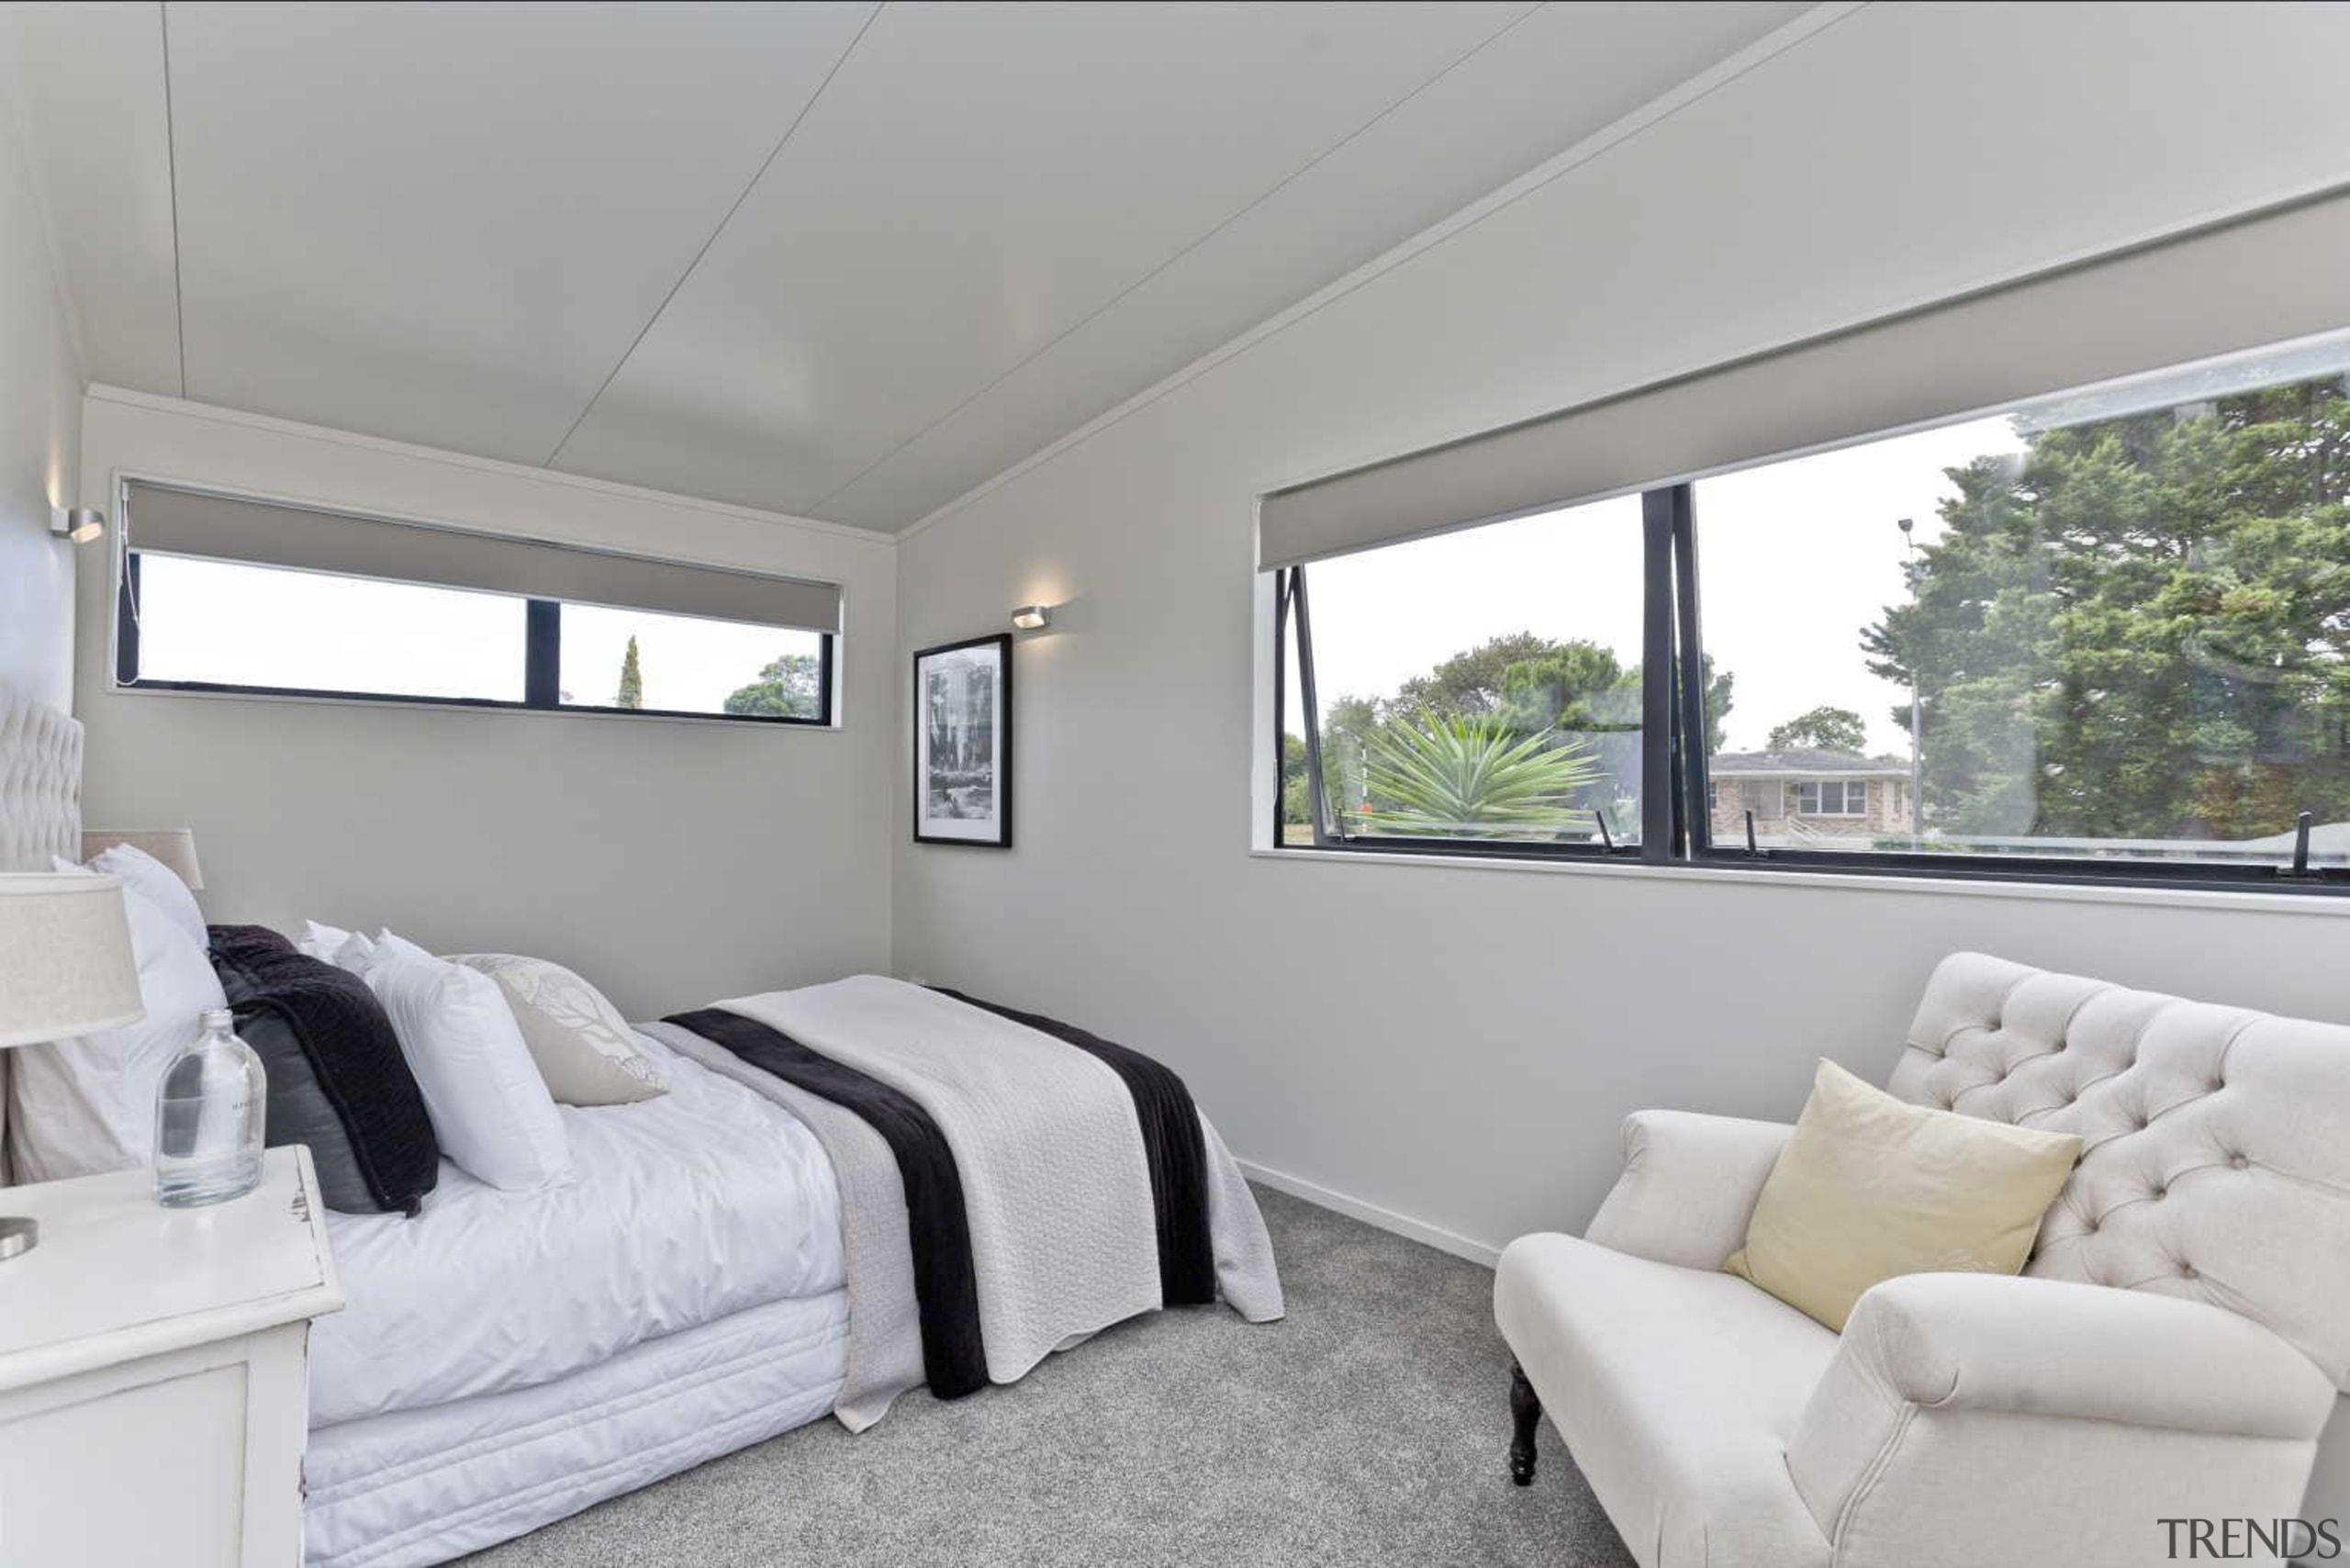 Bedroom design by Yellowfox - Bedroom - bedroom bedroom, home, house, interior design, property, real estate, room, window, gray